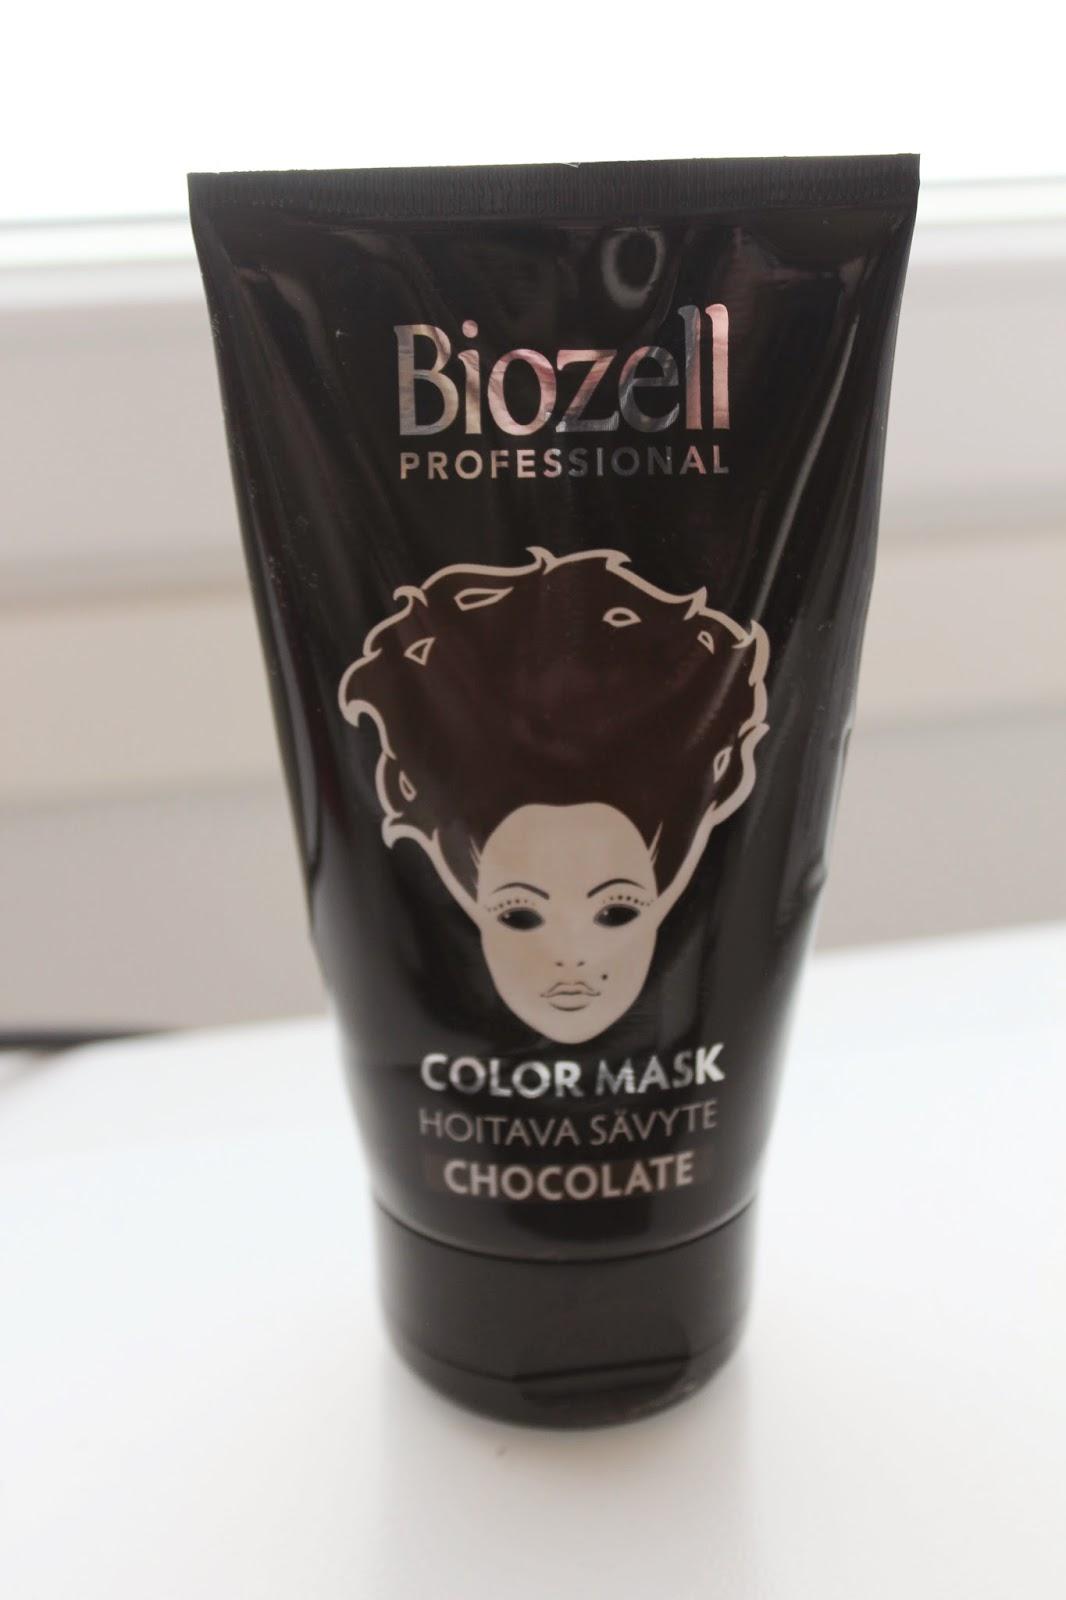 tähtipölyä: biozell professional color mask - chocolate